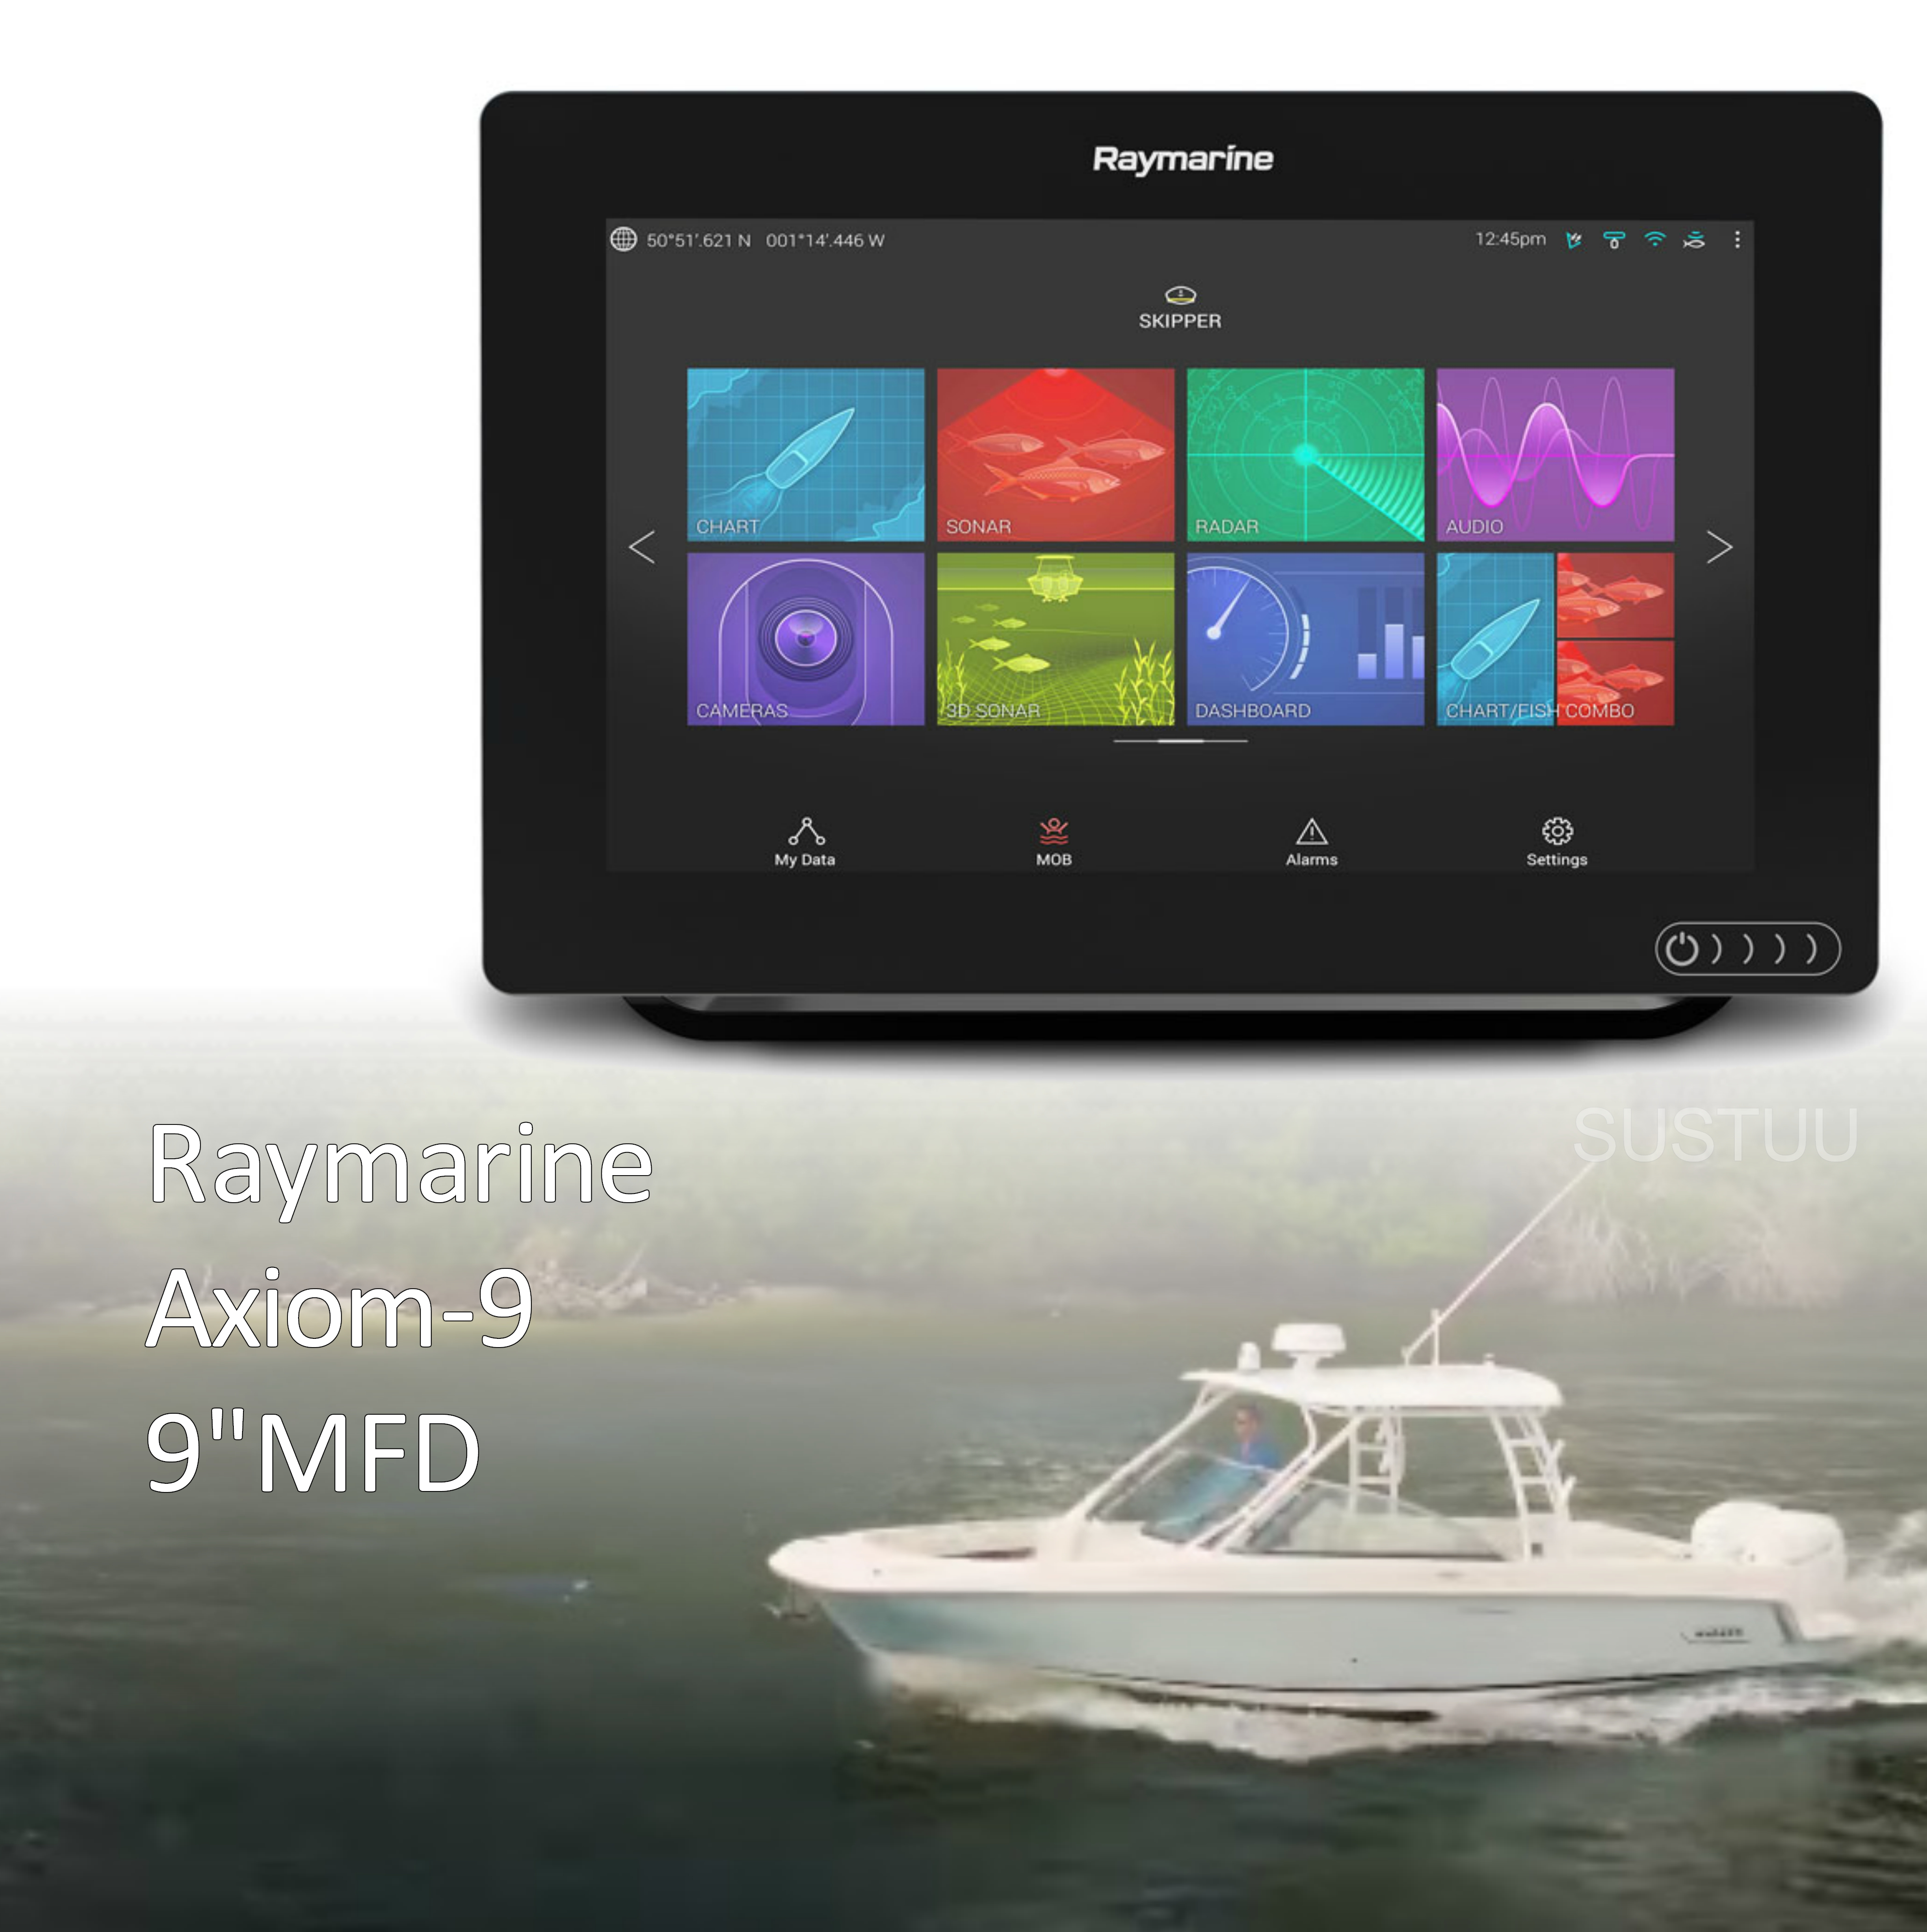 "Raymarine-E7036600NSD|Axiom-9|9"" MFD Display|Nav+ Small Chart|Marine Navigator"